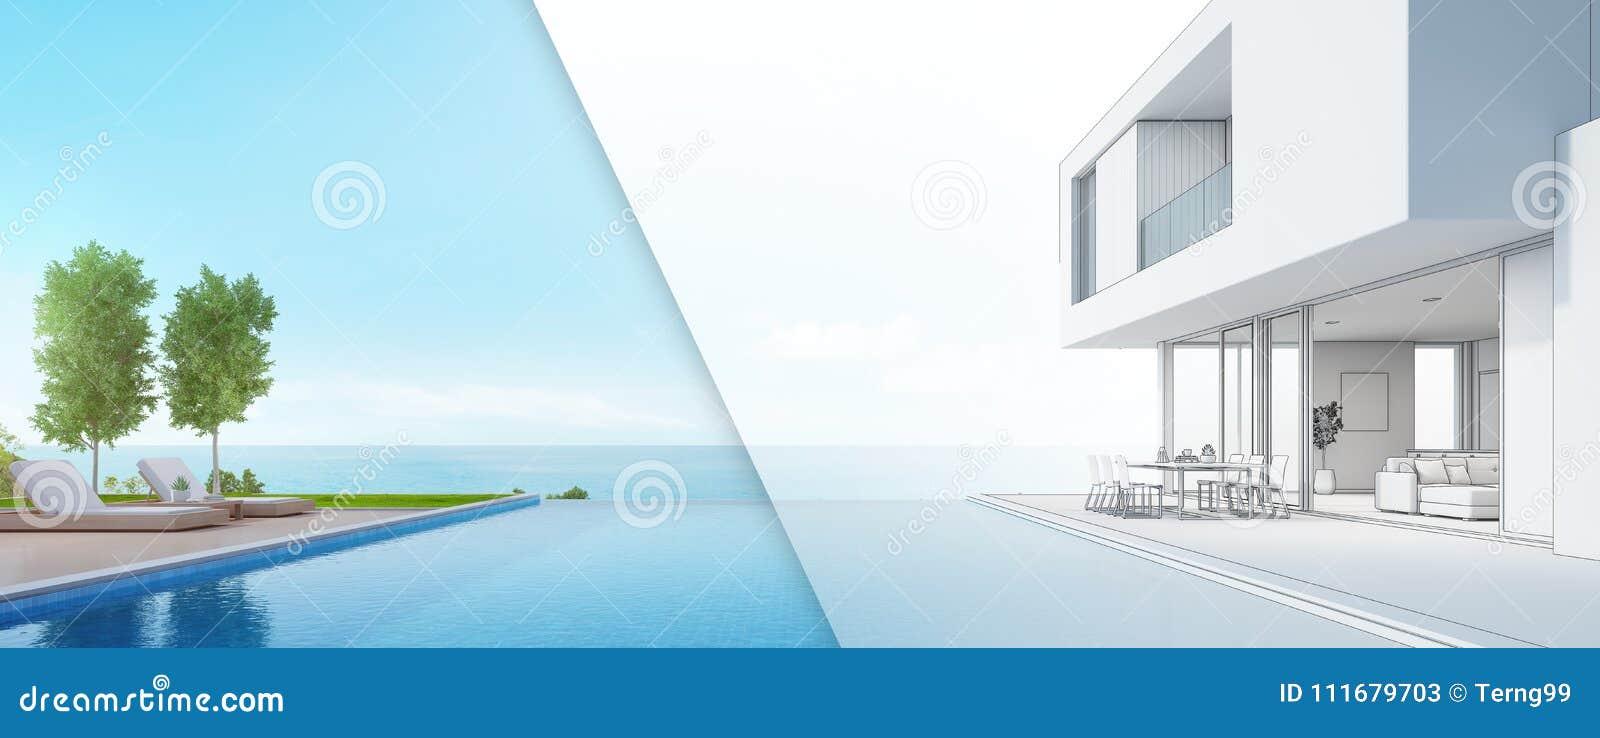 bcdd9f4aa340 Σπίτι παραλιών πολυτέλειας με την πισίνα άποψης θάλασσας και πεζούλι ...